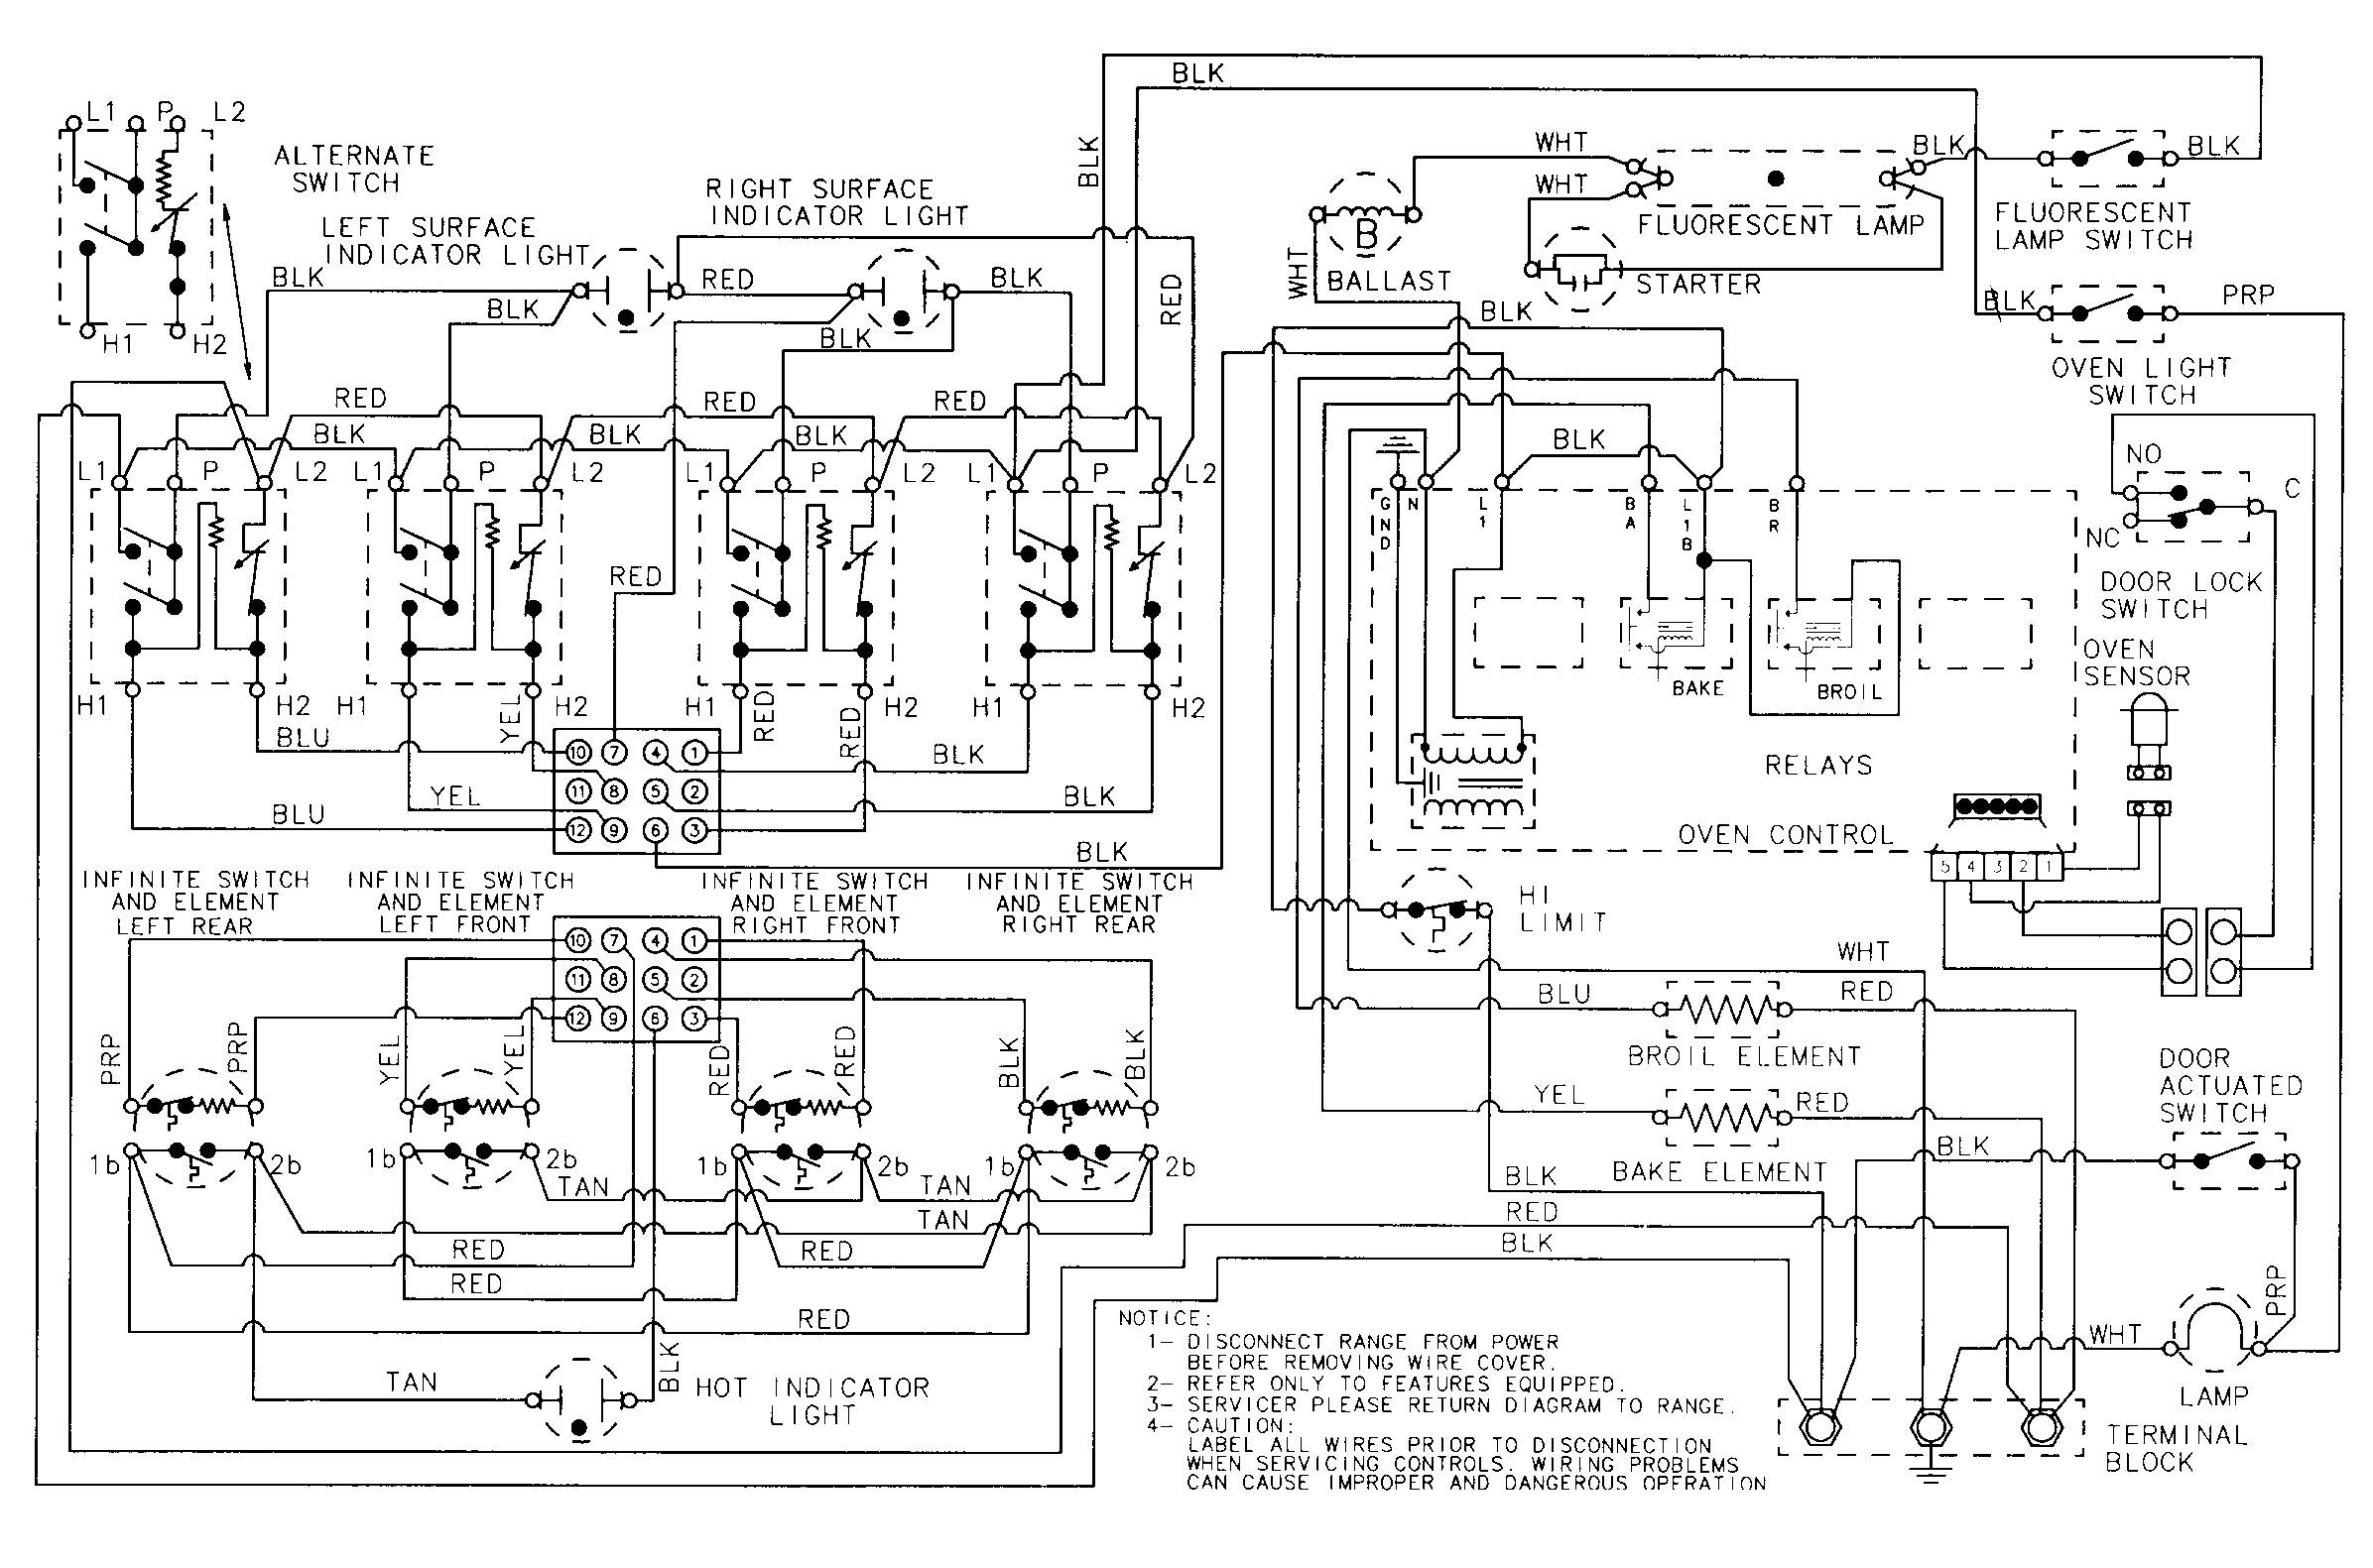 whirlpool sport duet dryer wiring diagram    whirlpool    electric    dryer       wiring       diagram    free    wiring       diagram        whirlpool    electric    dryer       wiring       diagram    free    wiring       diagram